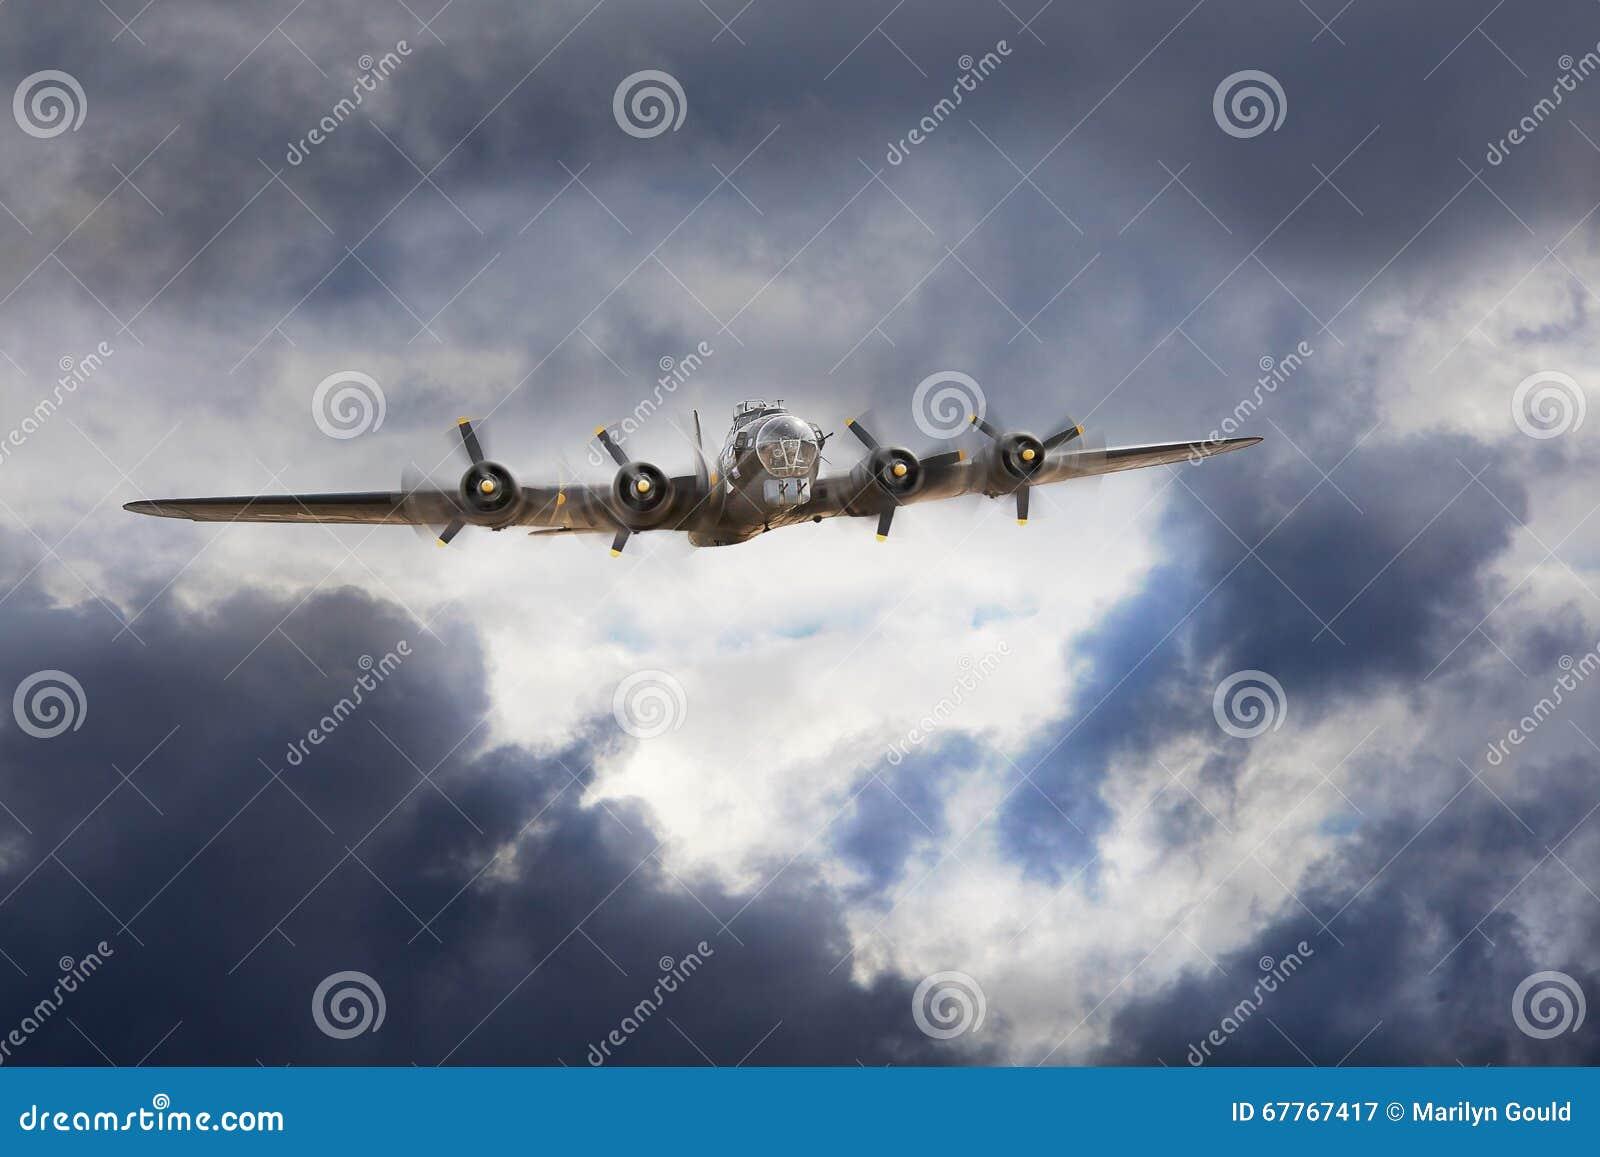 Download Boeing B-17 Bomber stock image. Image of 1930s, propeller - 67767417